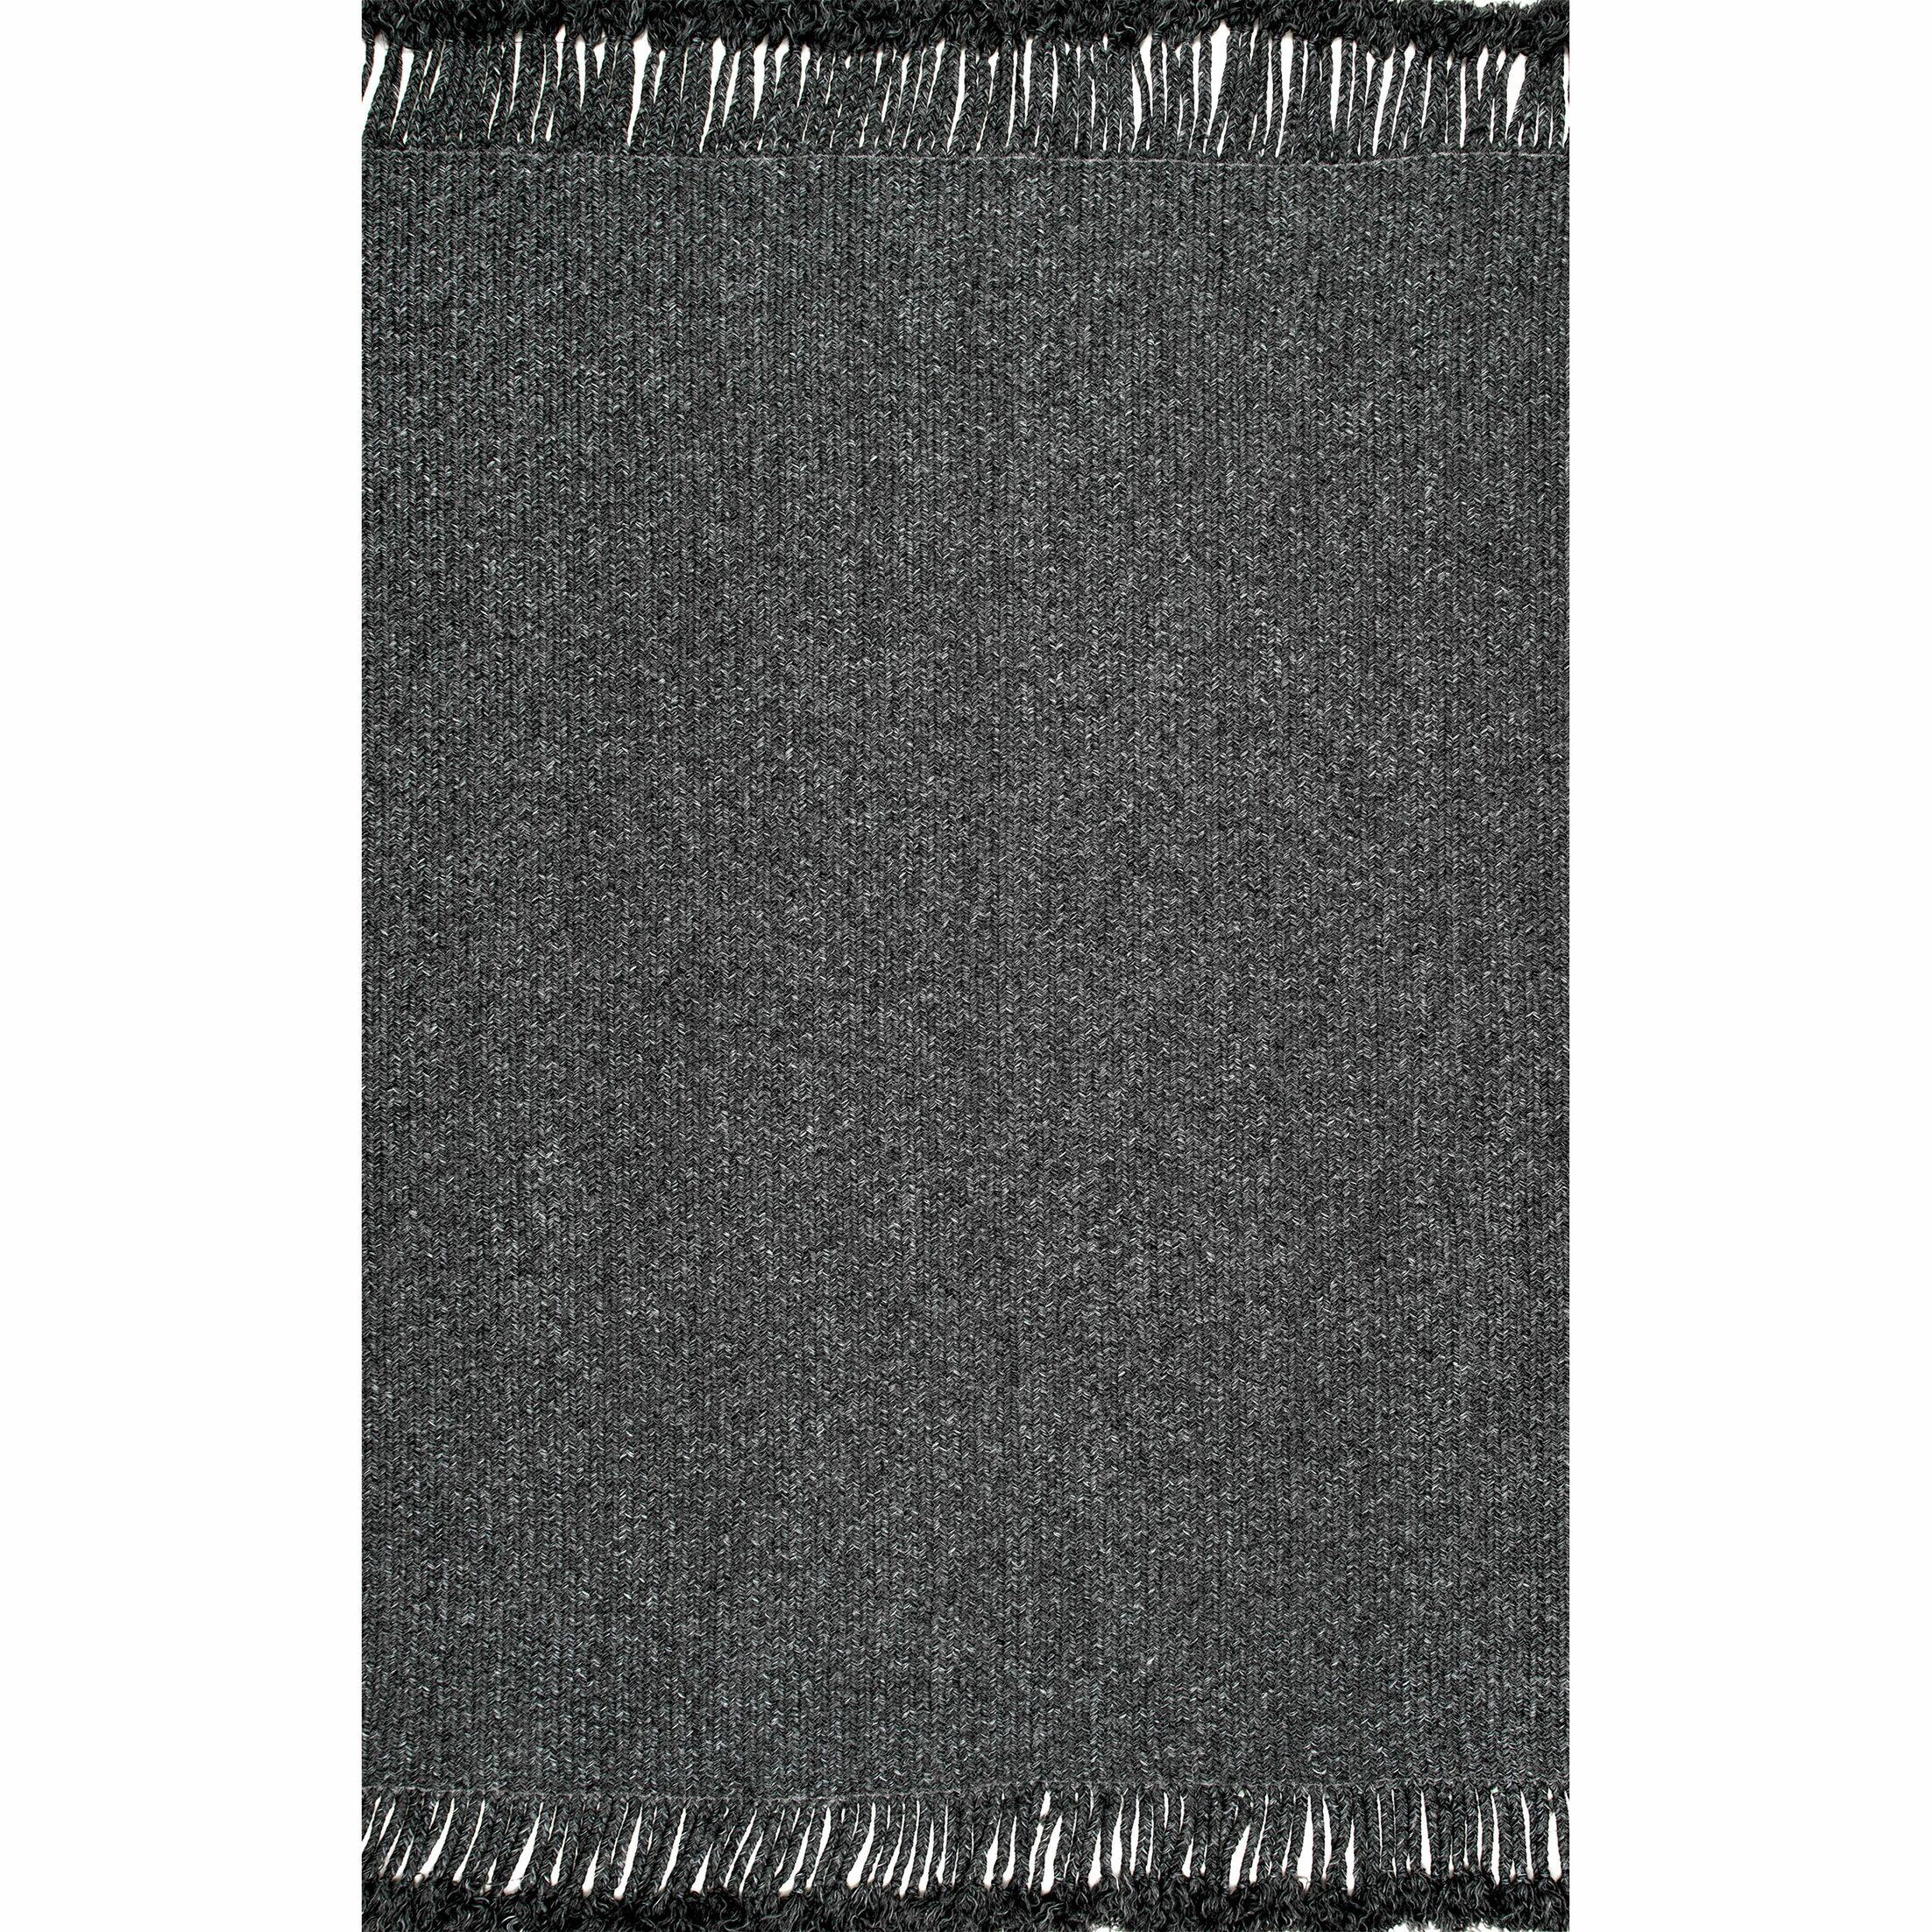 Bedard Charcoal Indoor/Outdoor Use Area Rug Rug Size: Rectangle 7' 6